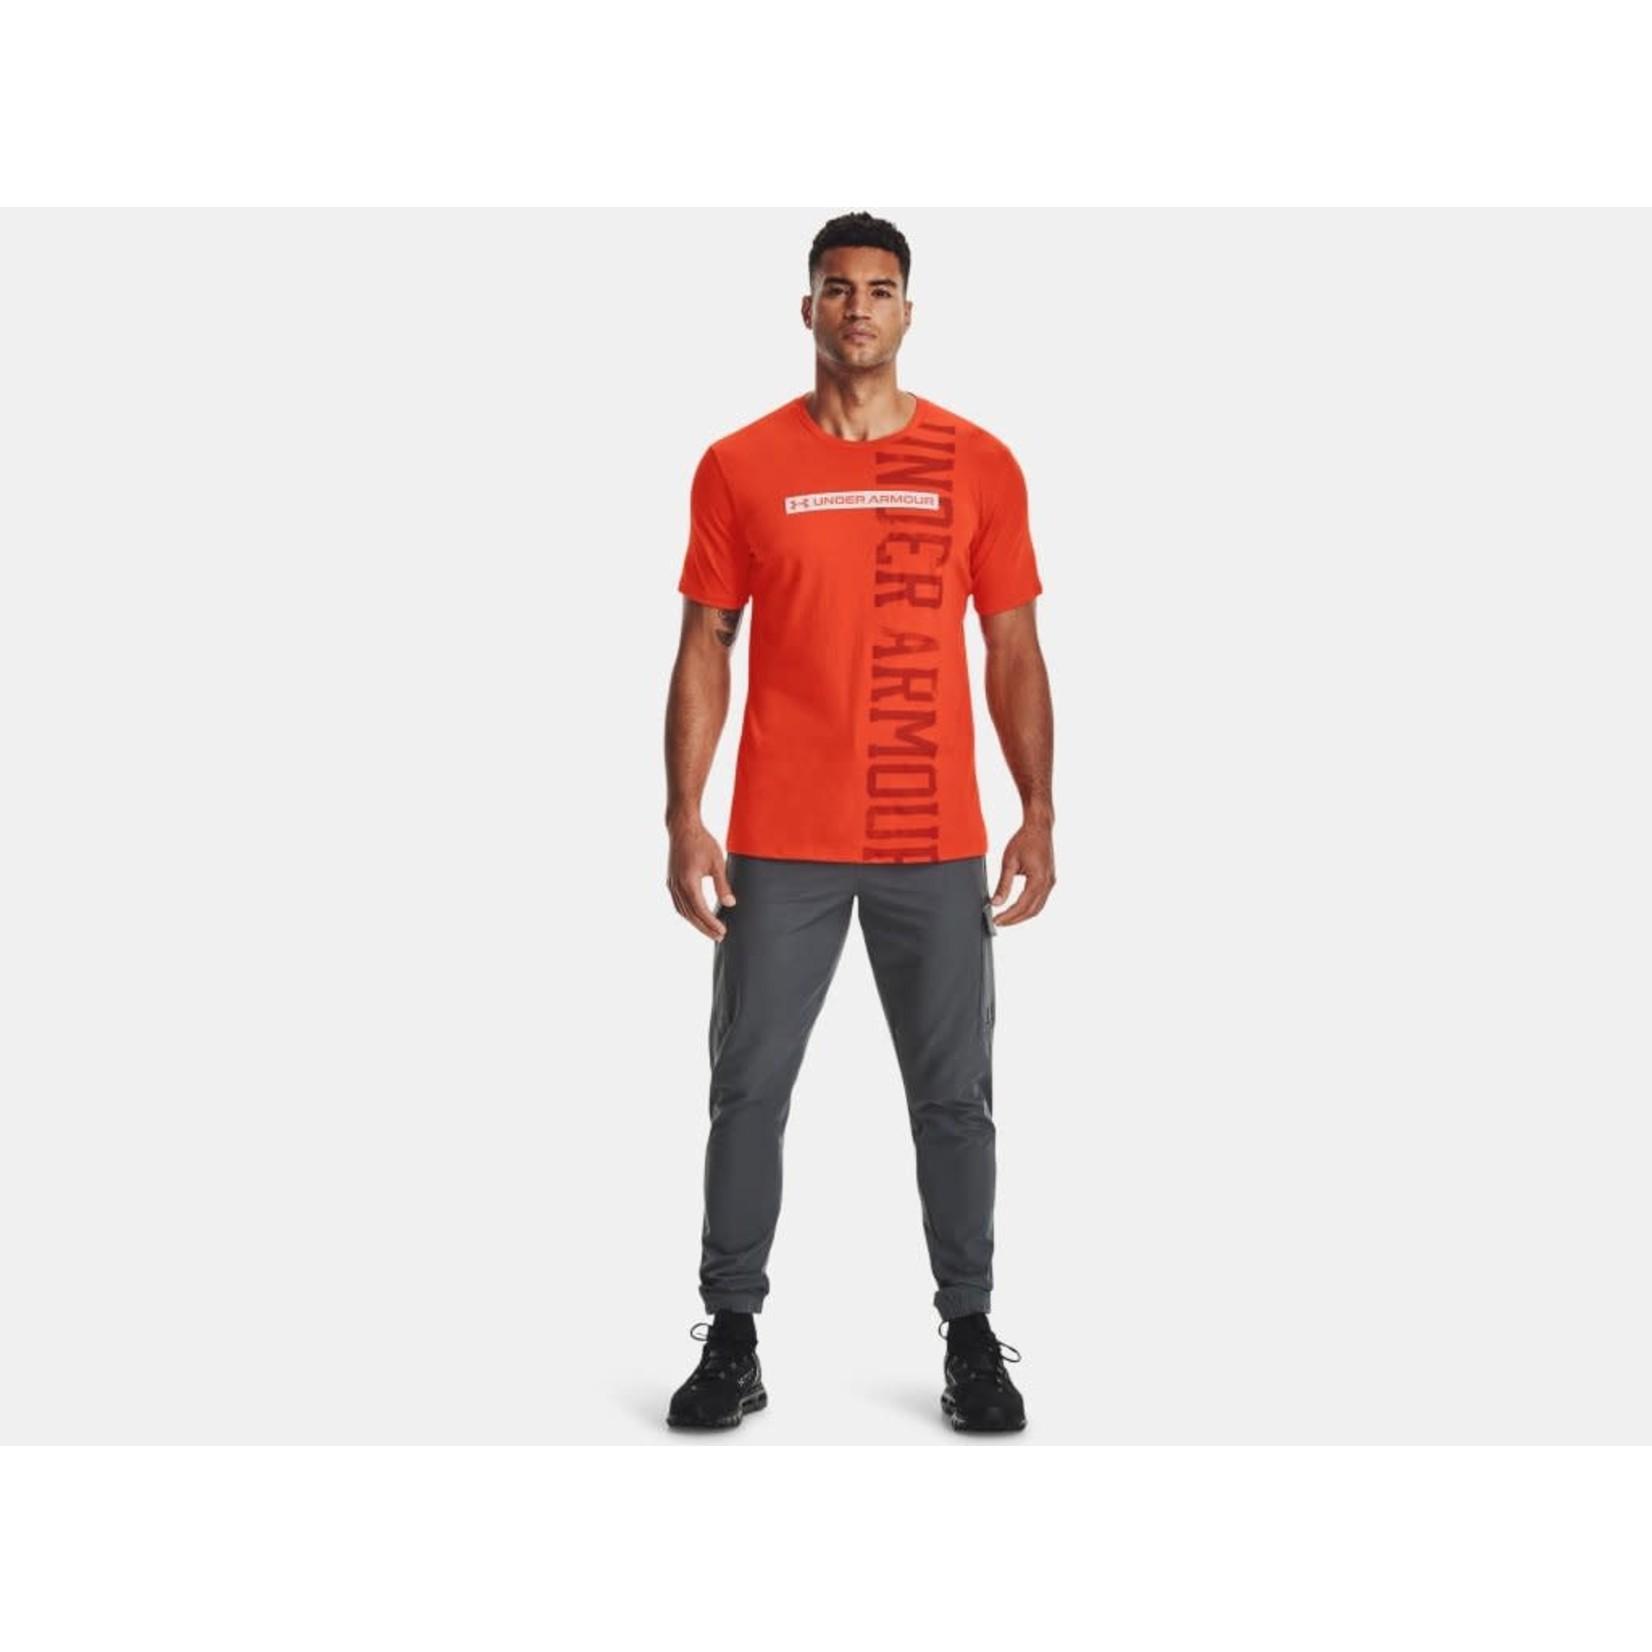 Under Armour Under Armour T-Shirt, Vertical Signature, Mens